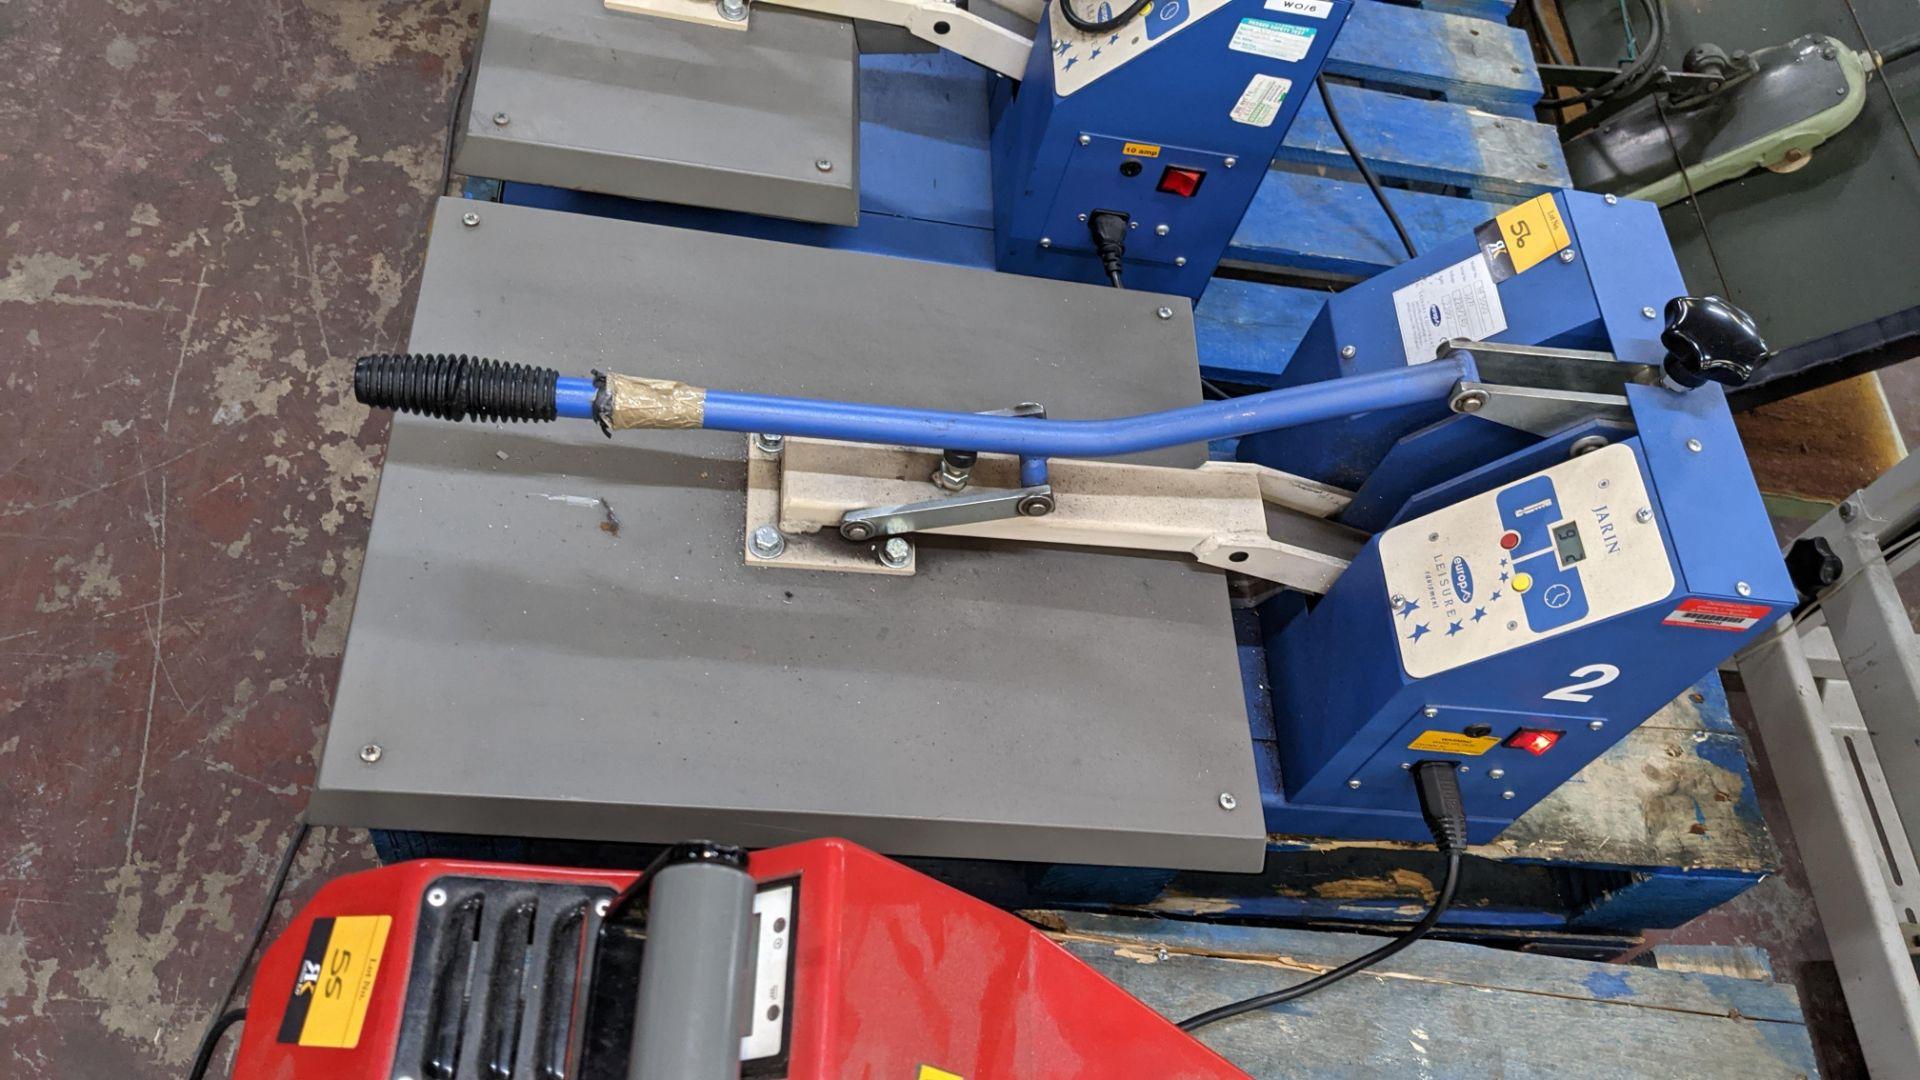 Europa Jarin benchtop heat transfer press model HF5000 - Image 4 of 13